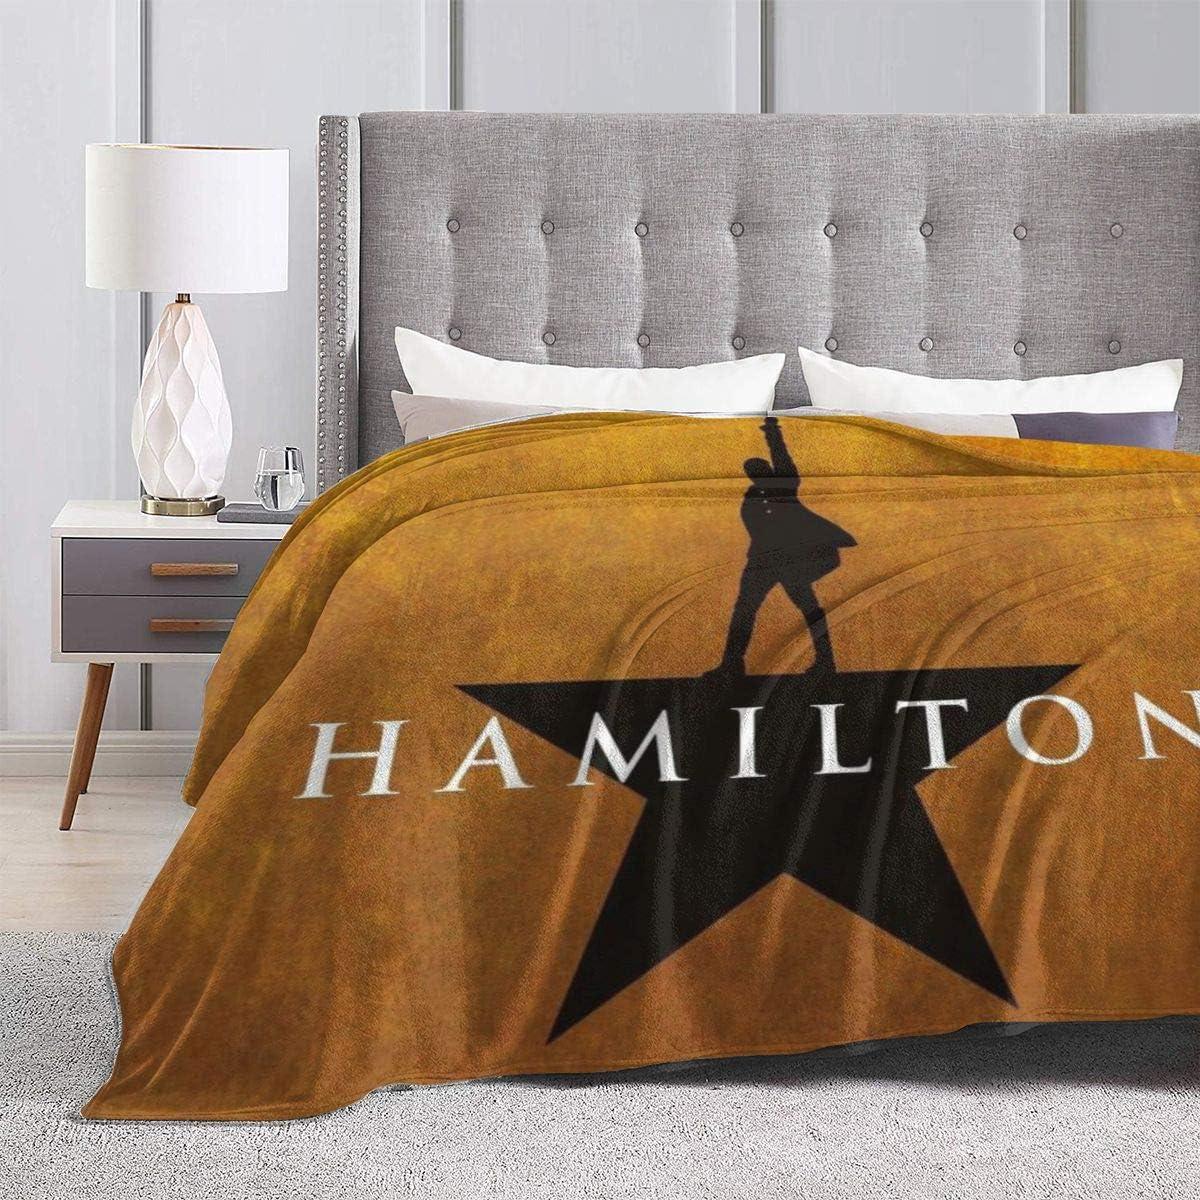 Hamilton Ultra-Soft Micro Fleece Blanket